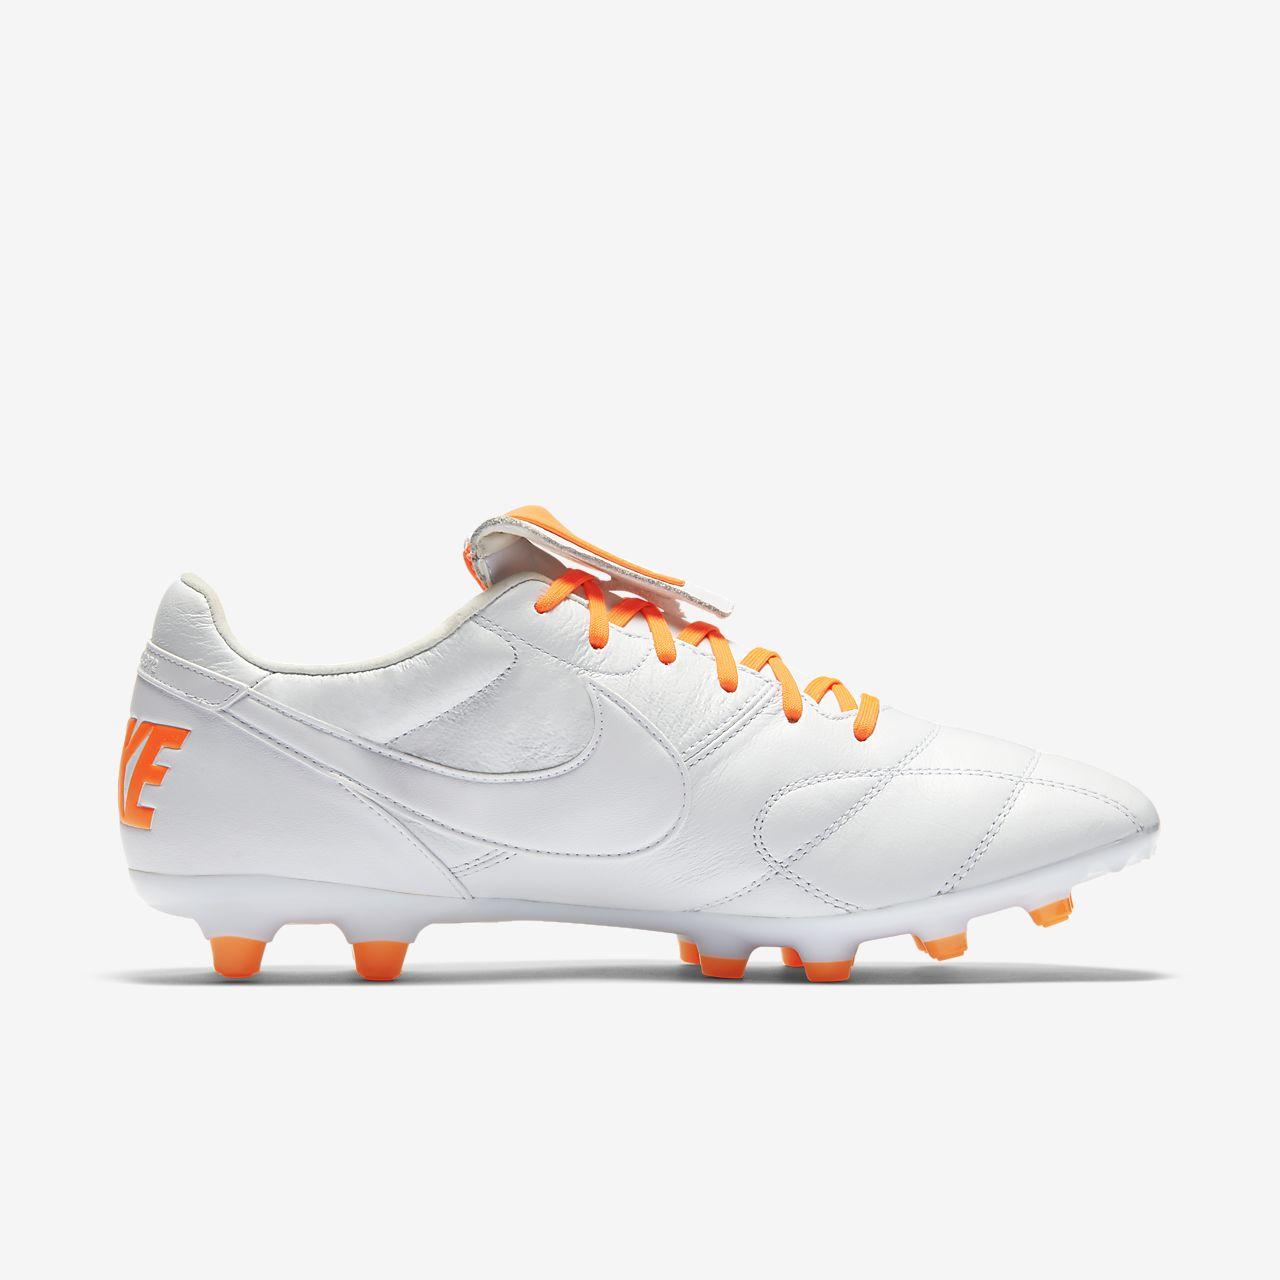 3322baf5c Nike Premier II FG Botas de fútbol para terreno firme. Nike.com ES